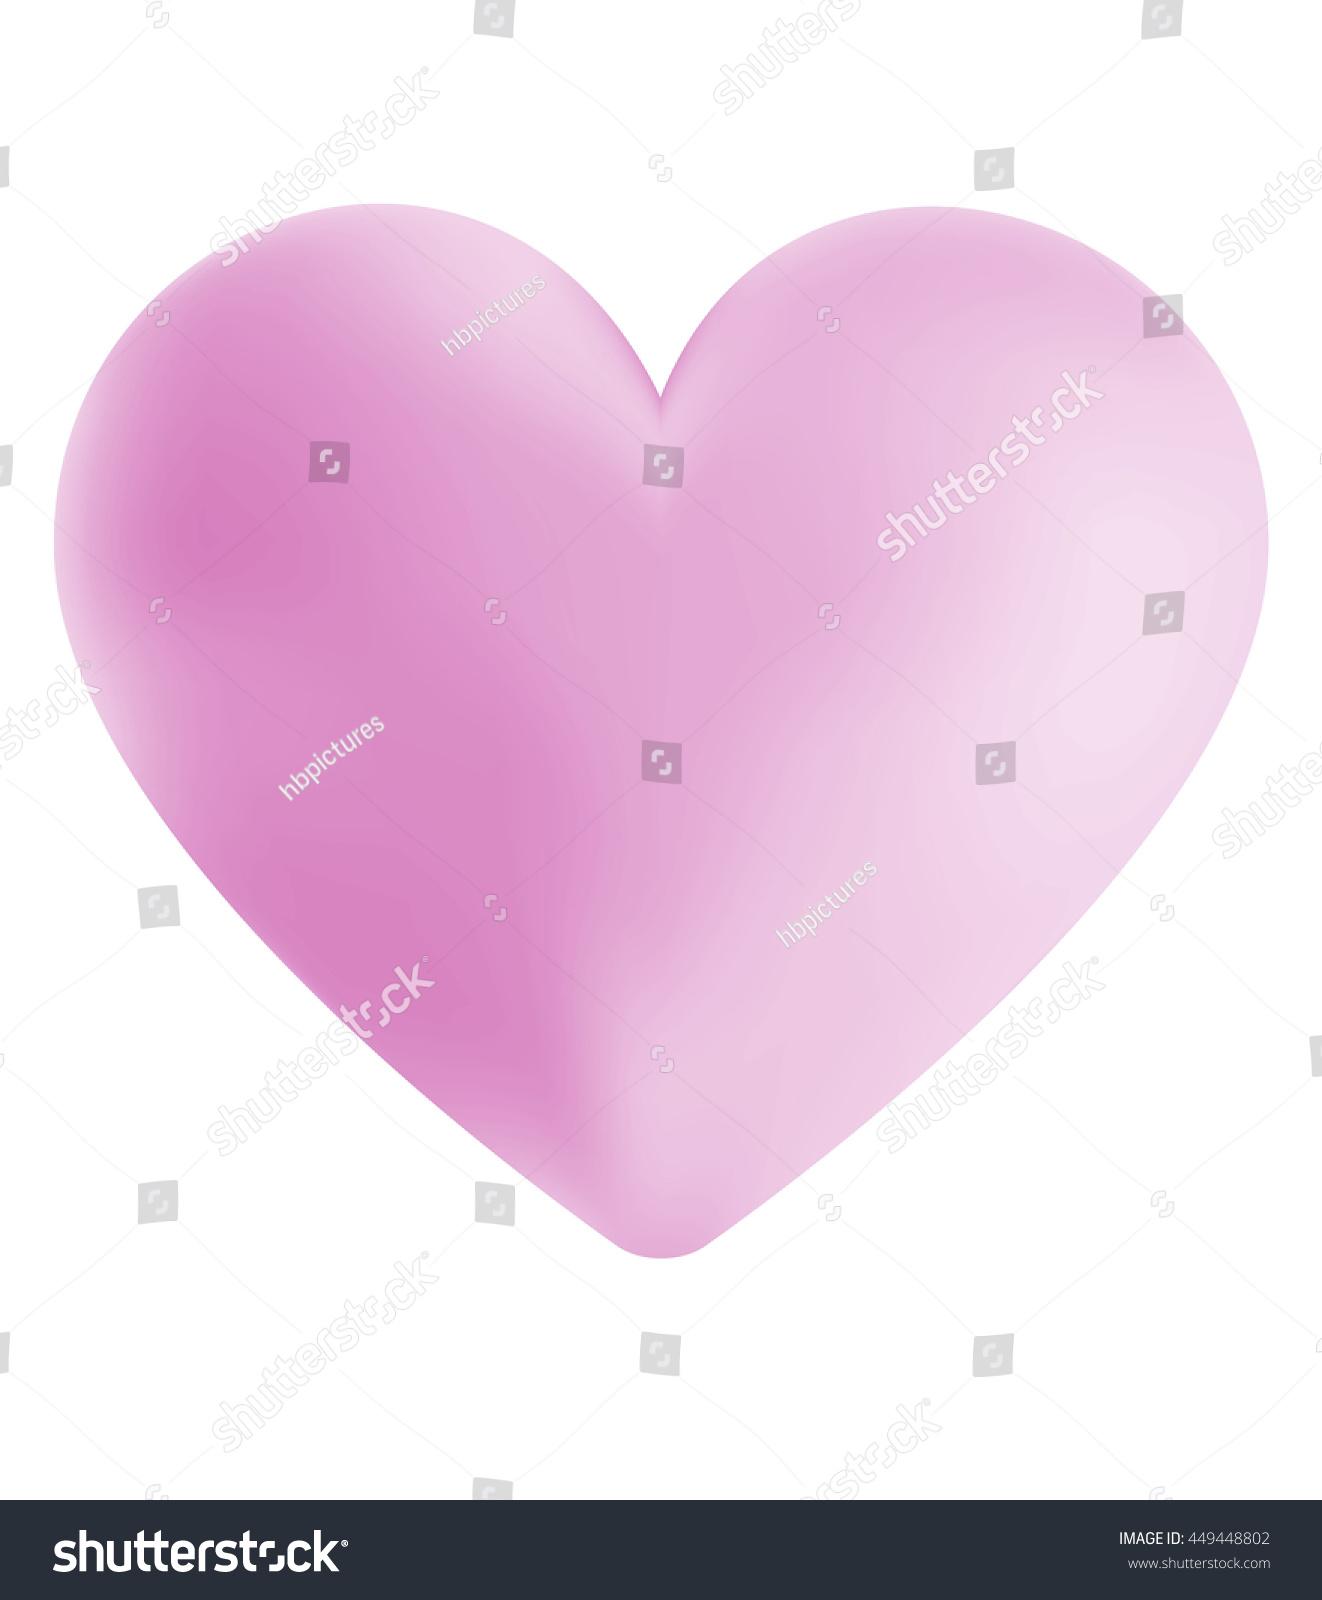 amorous 3d heart shape clouds texture stock illustration